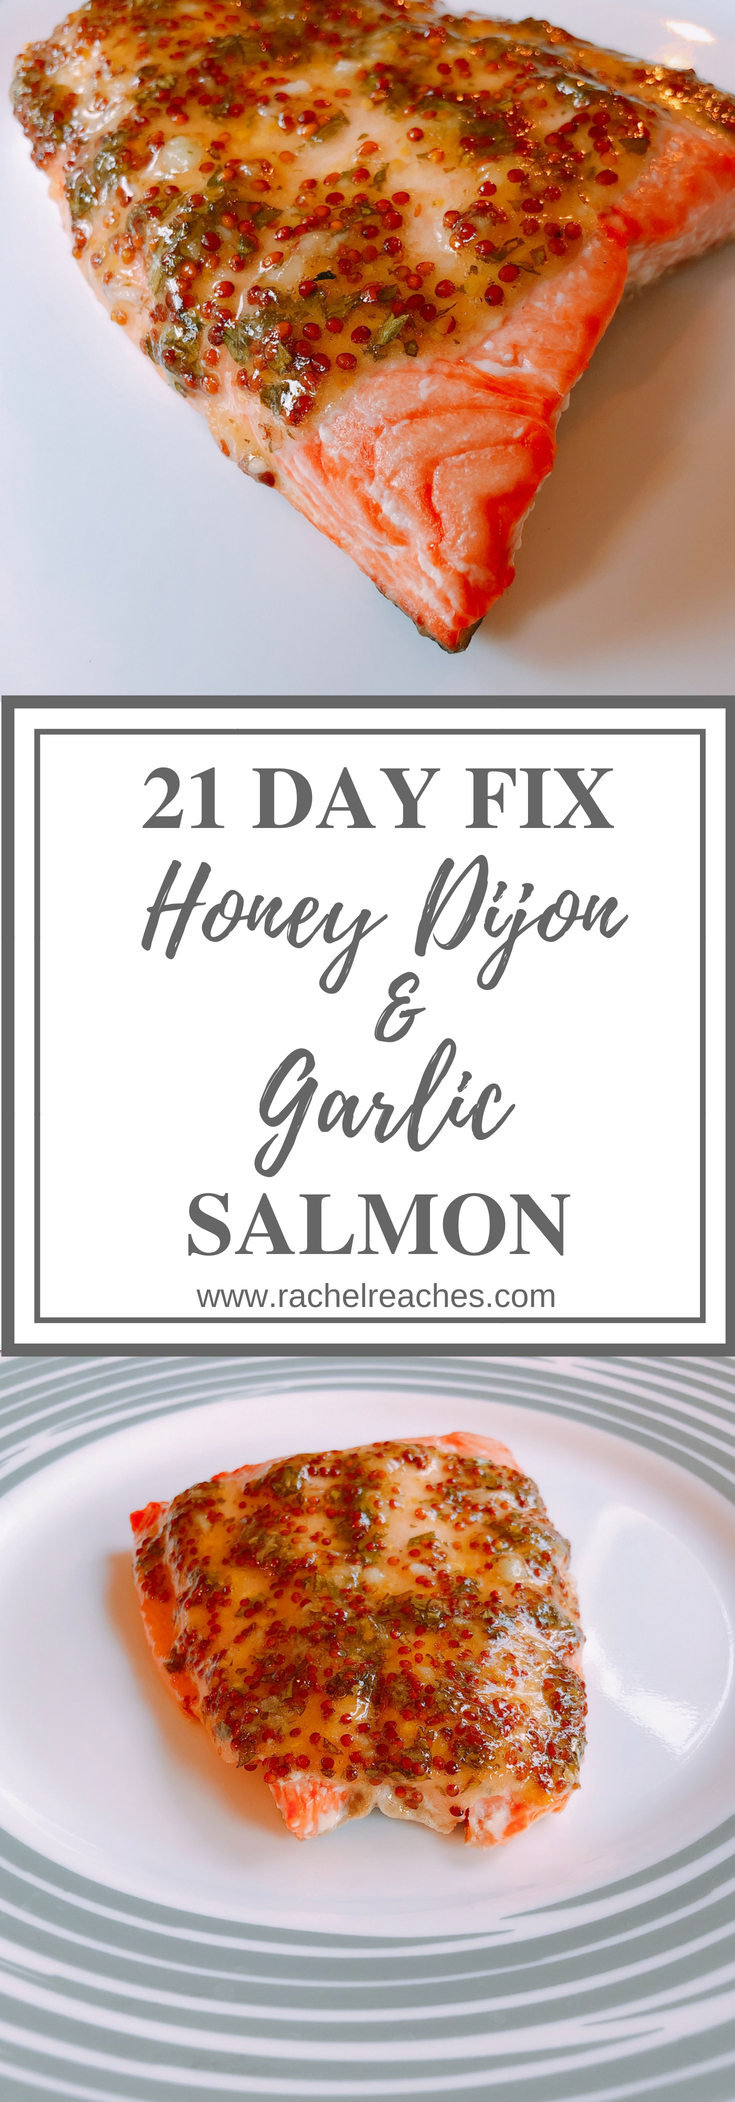 Honey Dijon & Garlic Salmon Pin - 21 Day Fix.png